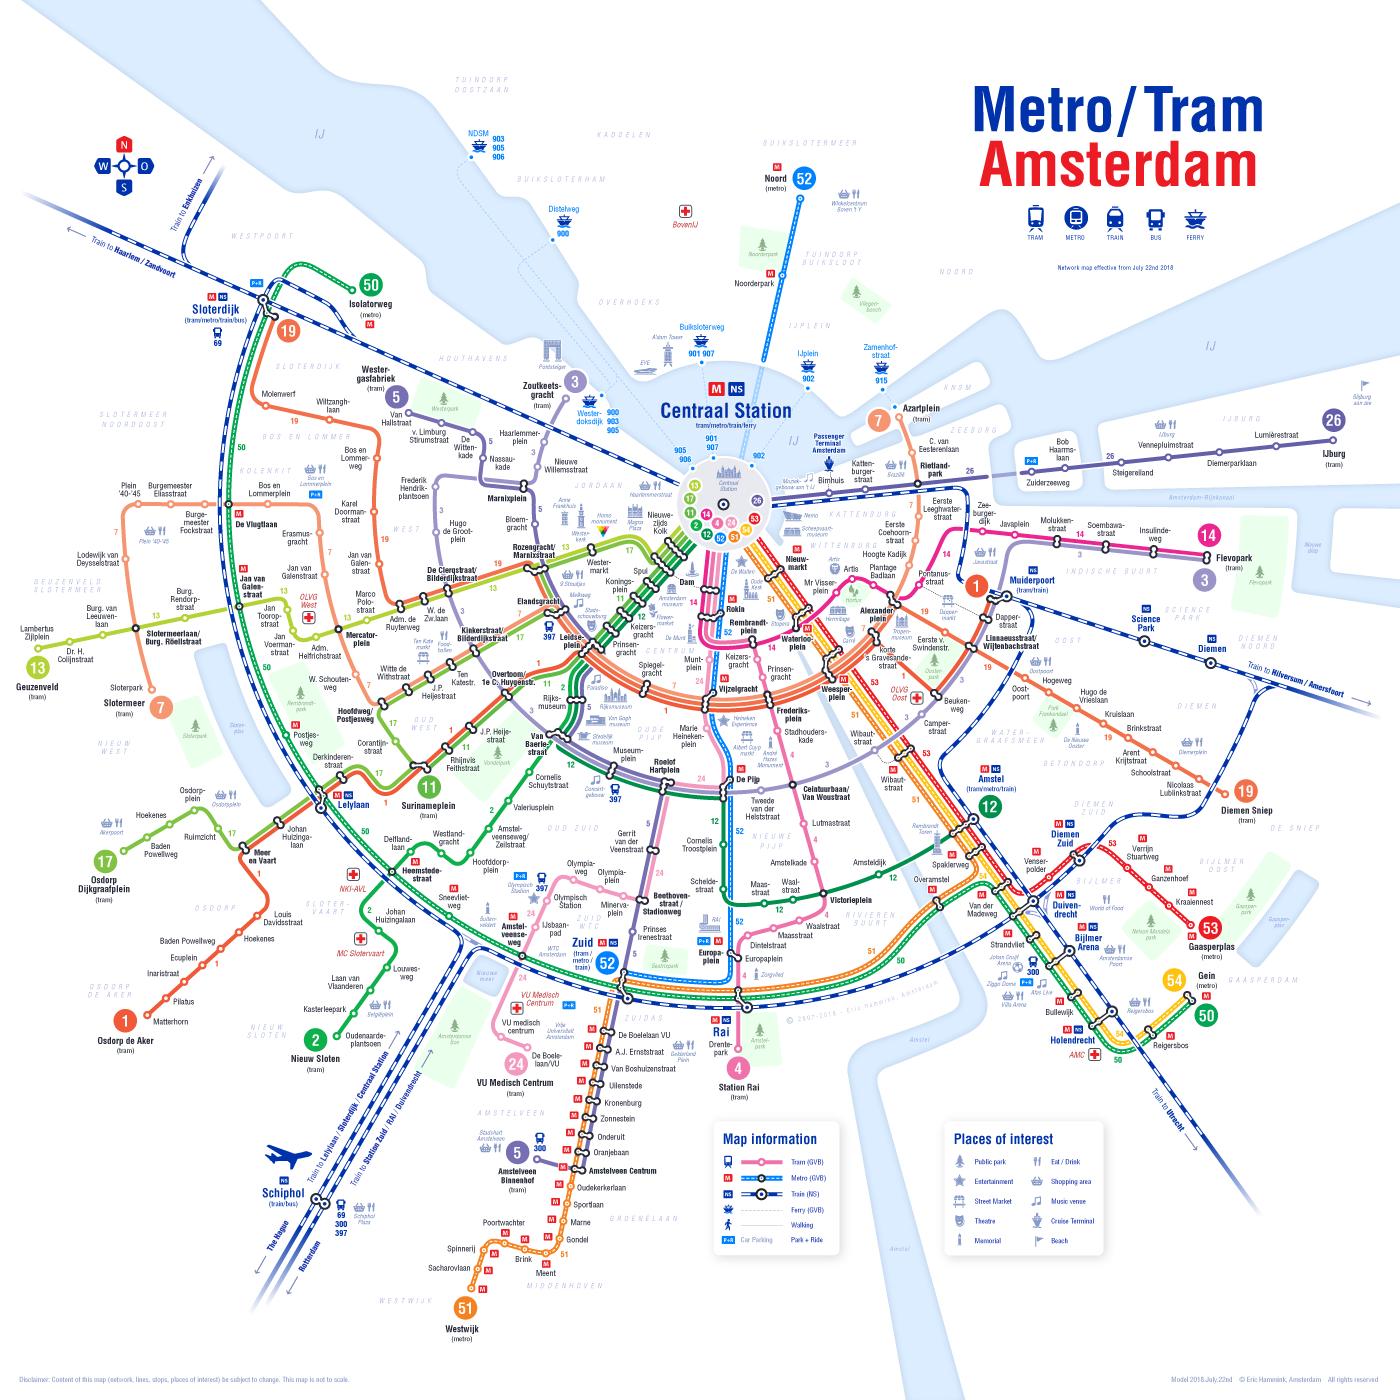 Tram Map Amsterdam Metro/Tram Amsterdam 2018 on Behance Tram Map Amsterdam